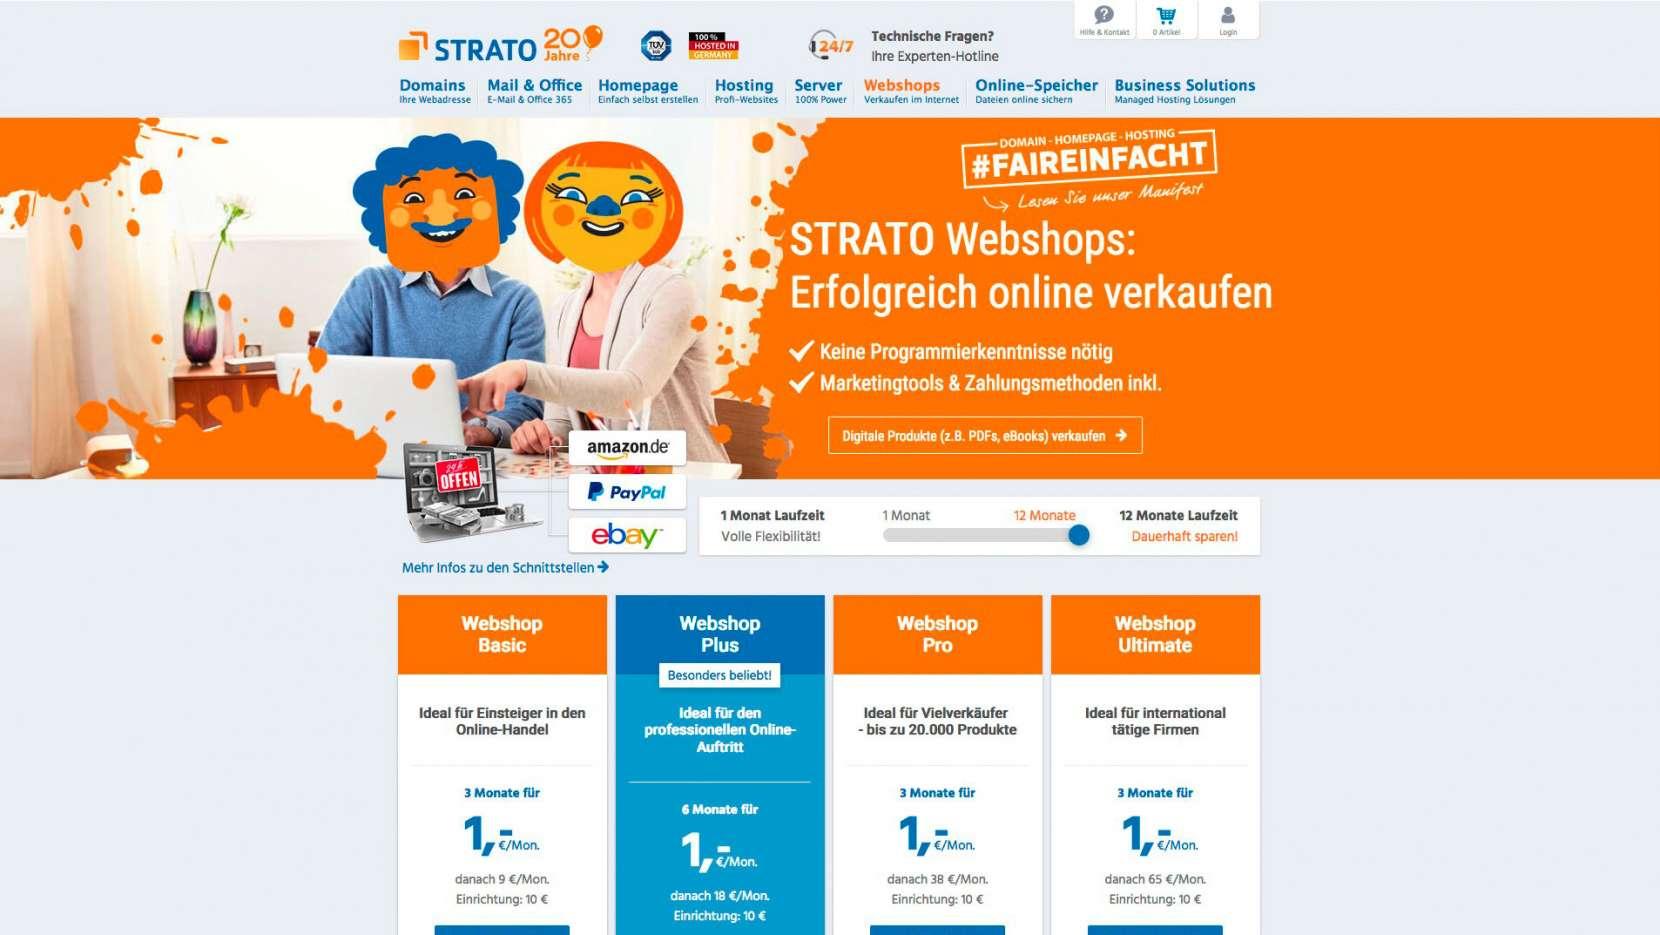 strato-04-1660x935.jpg